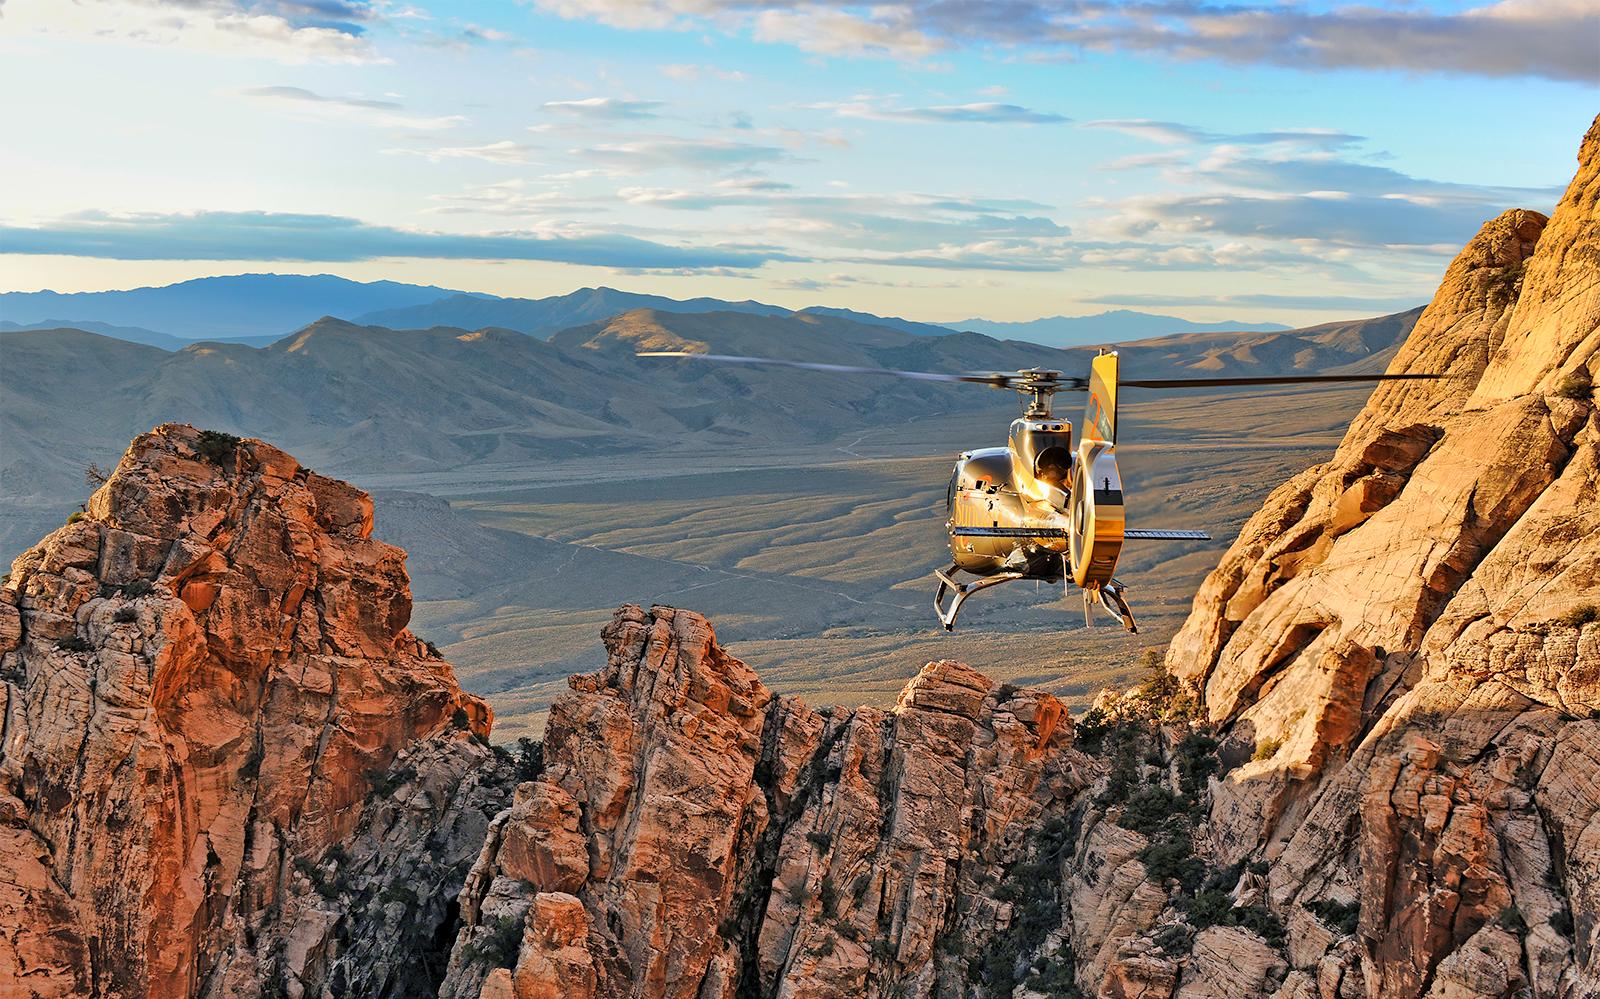 العلامة Helicopter Tour Grand Canyon West Rim أفضل الصور